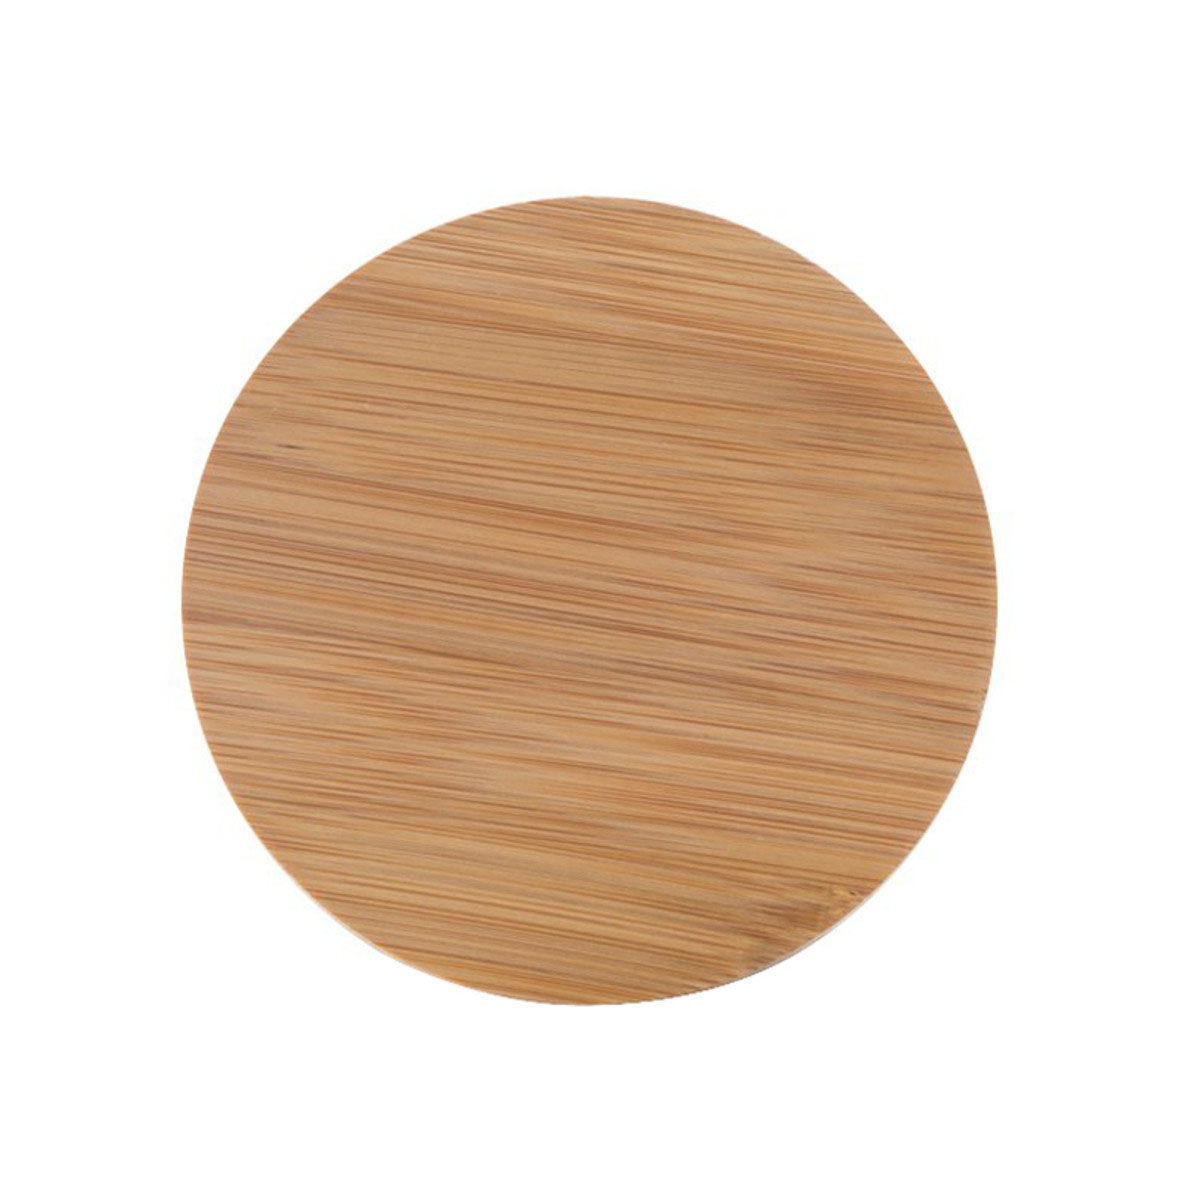 Bamboo Lid For 5oz Premium Glass Jar (100 Qty.)